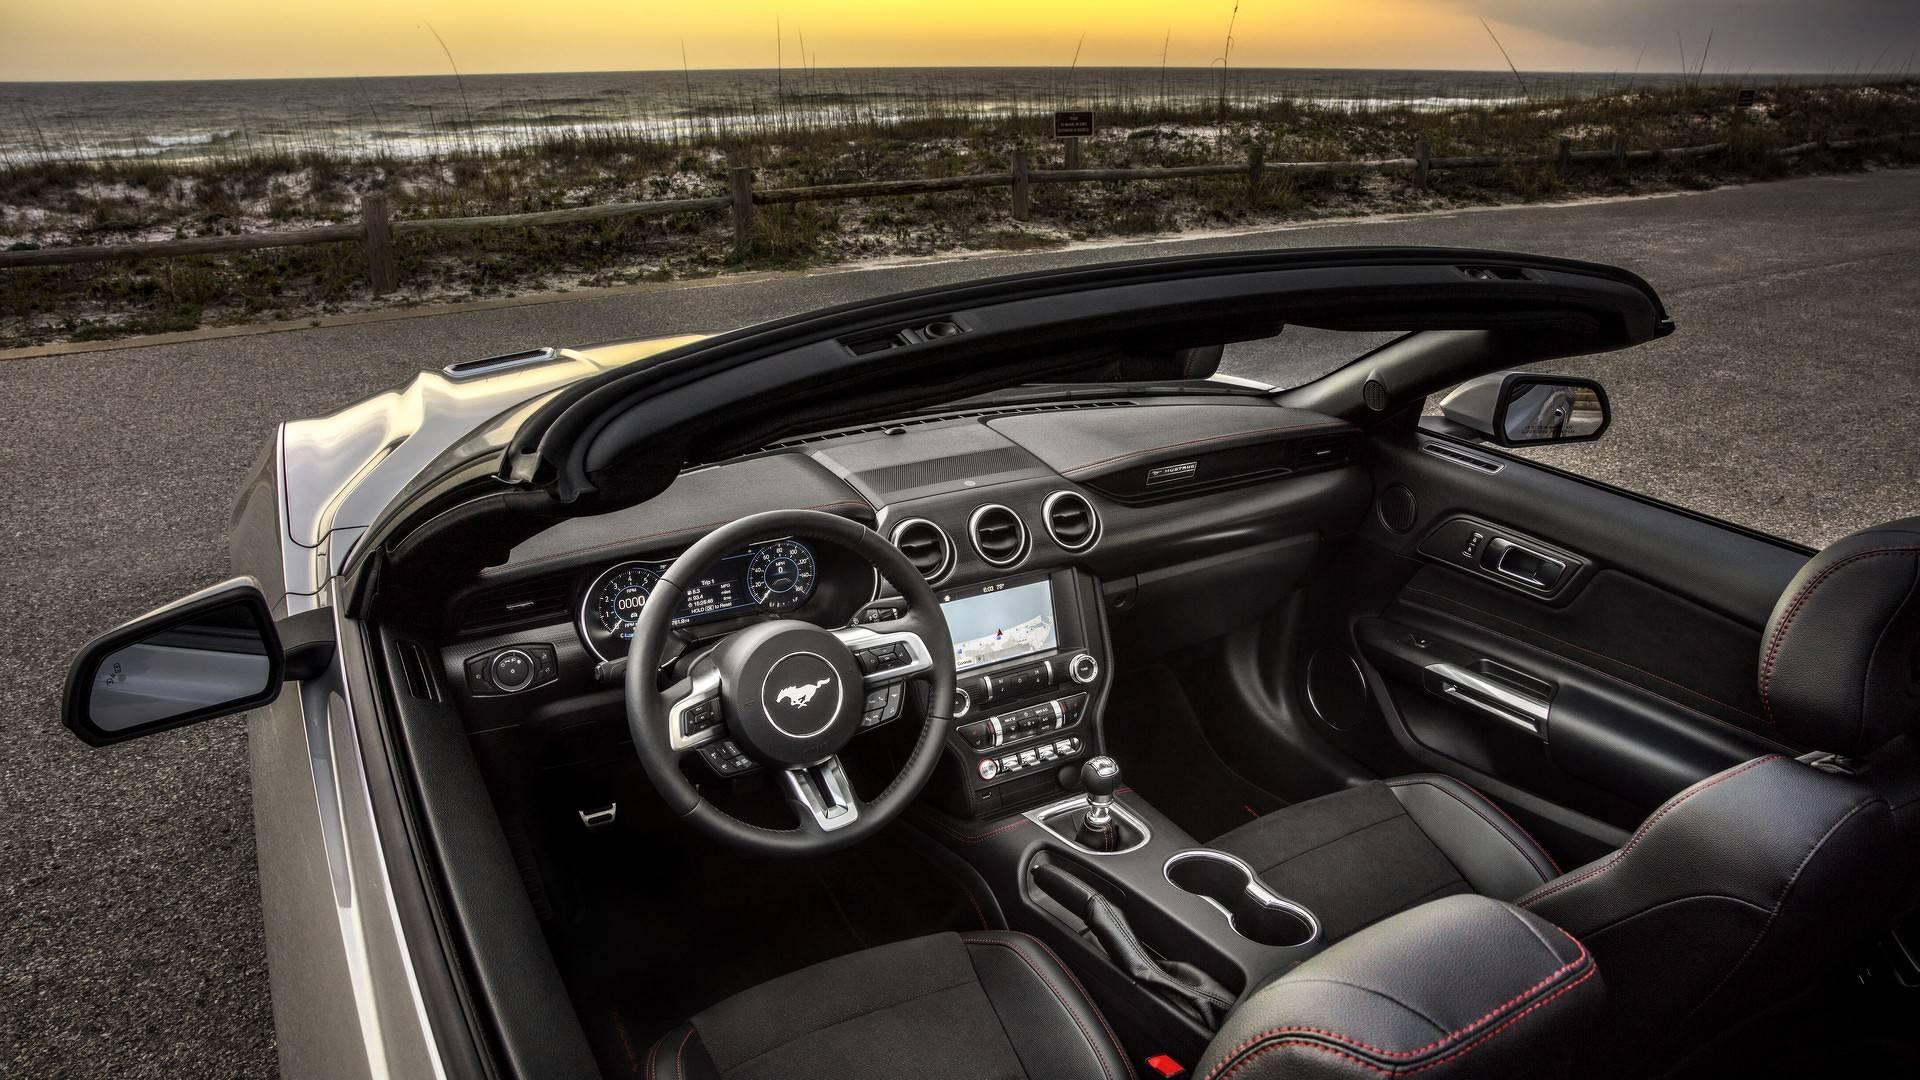 5aa638579937d 2019 ford mustang california special فورد موستانگ مارکس ۲۰۱۹ رونمایی شد   اجاره ماشین